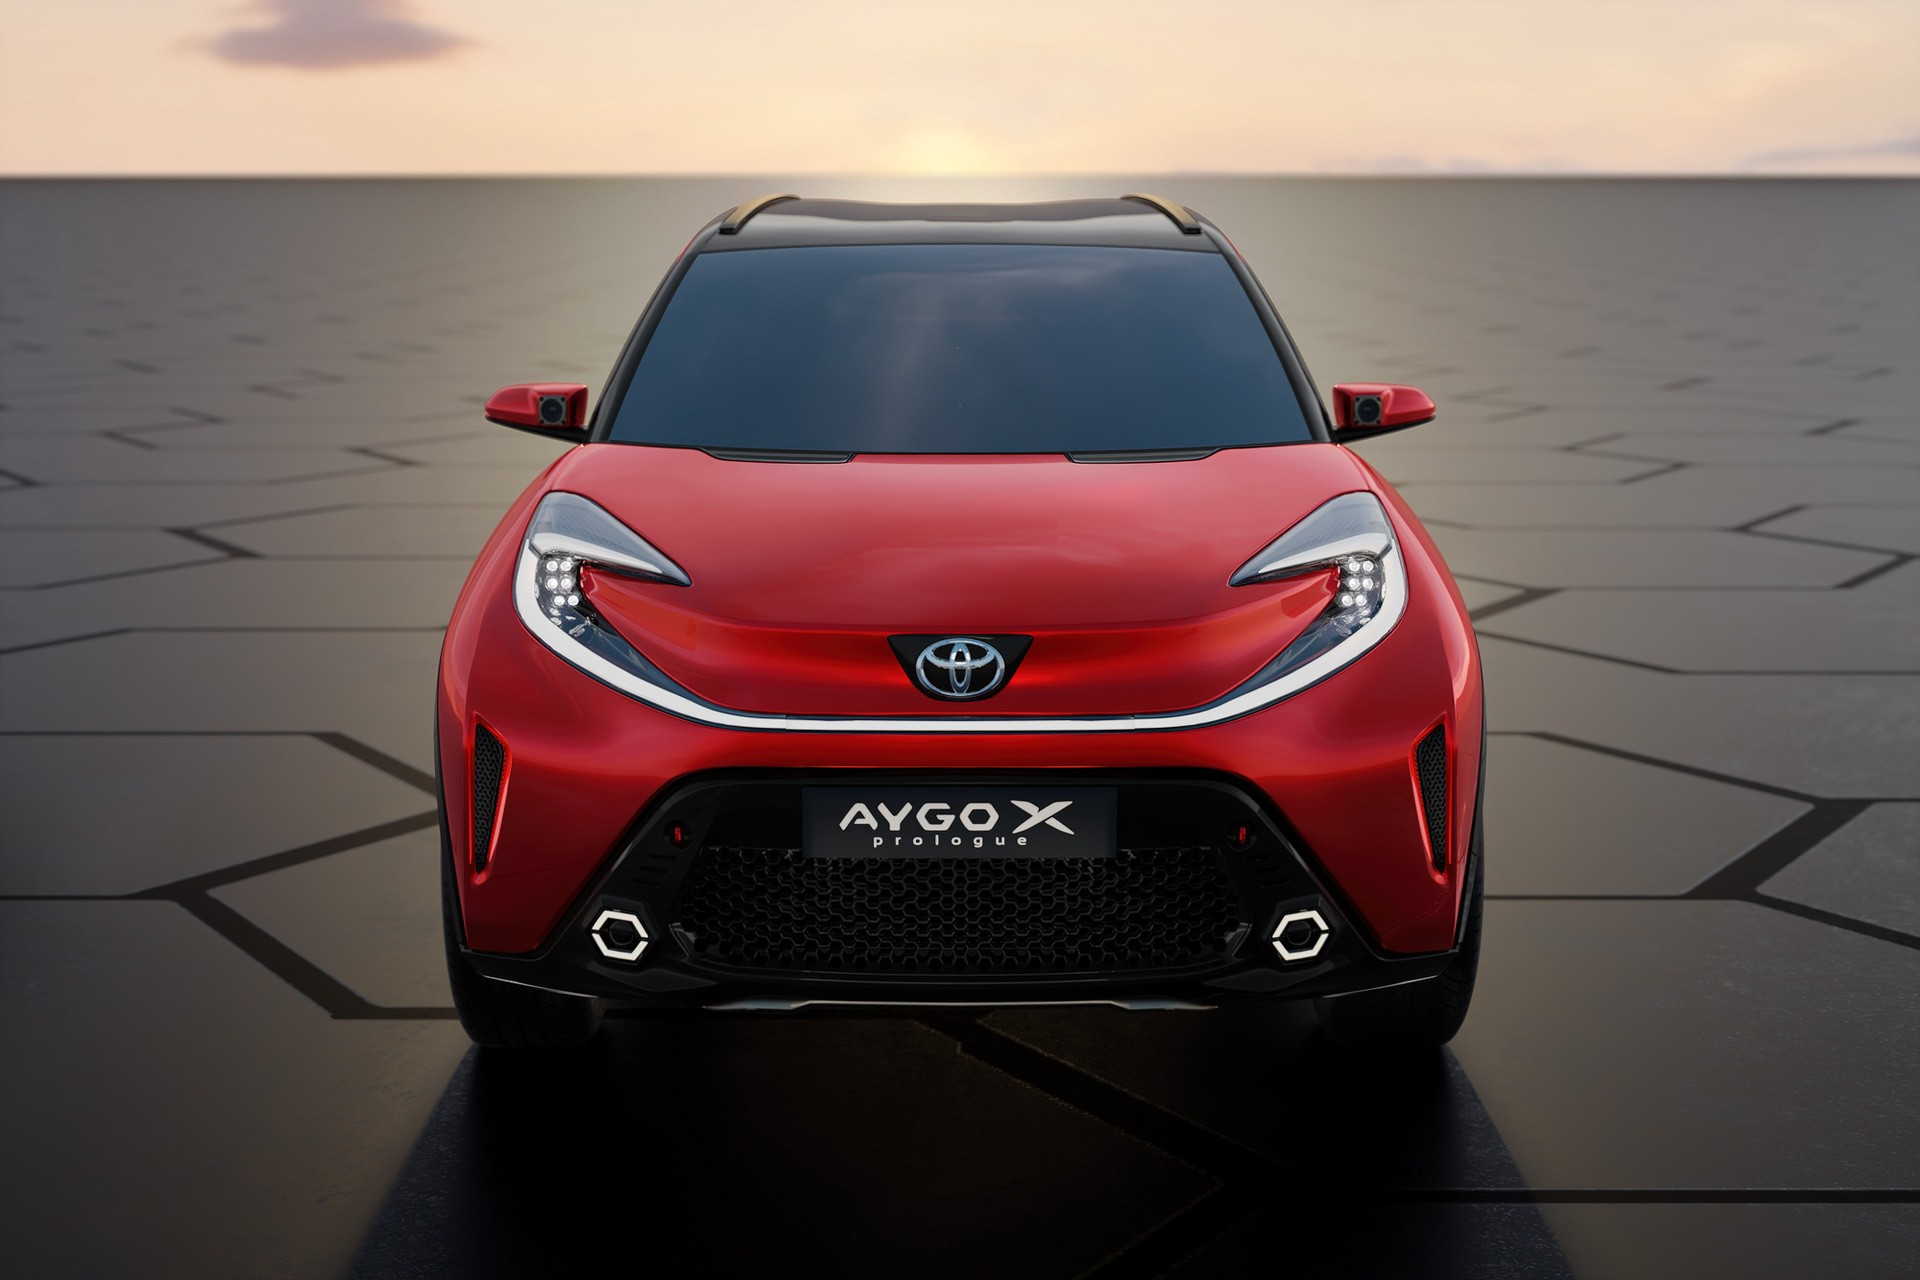 Toyota_Aygo_X_prologue-0023